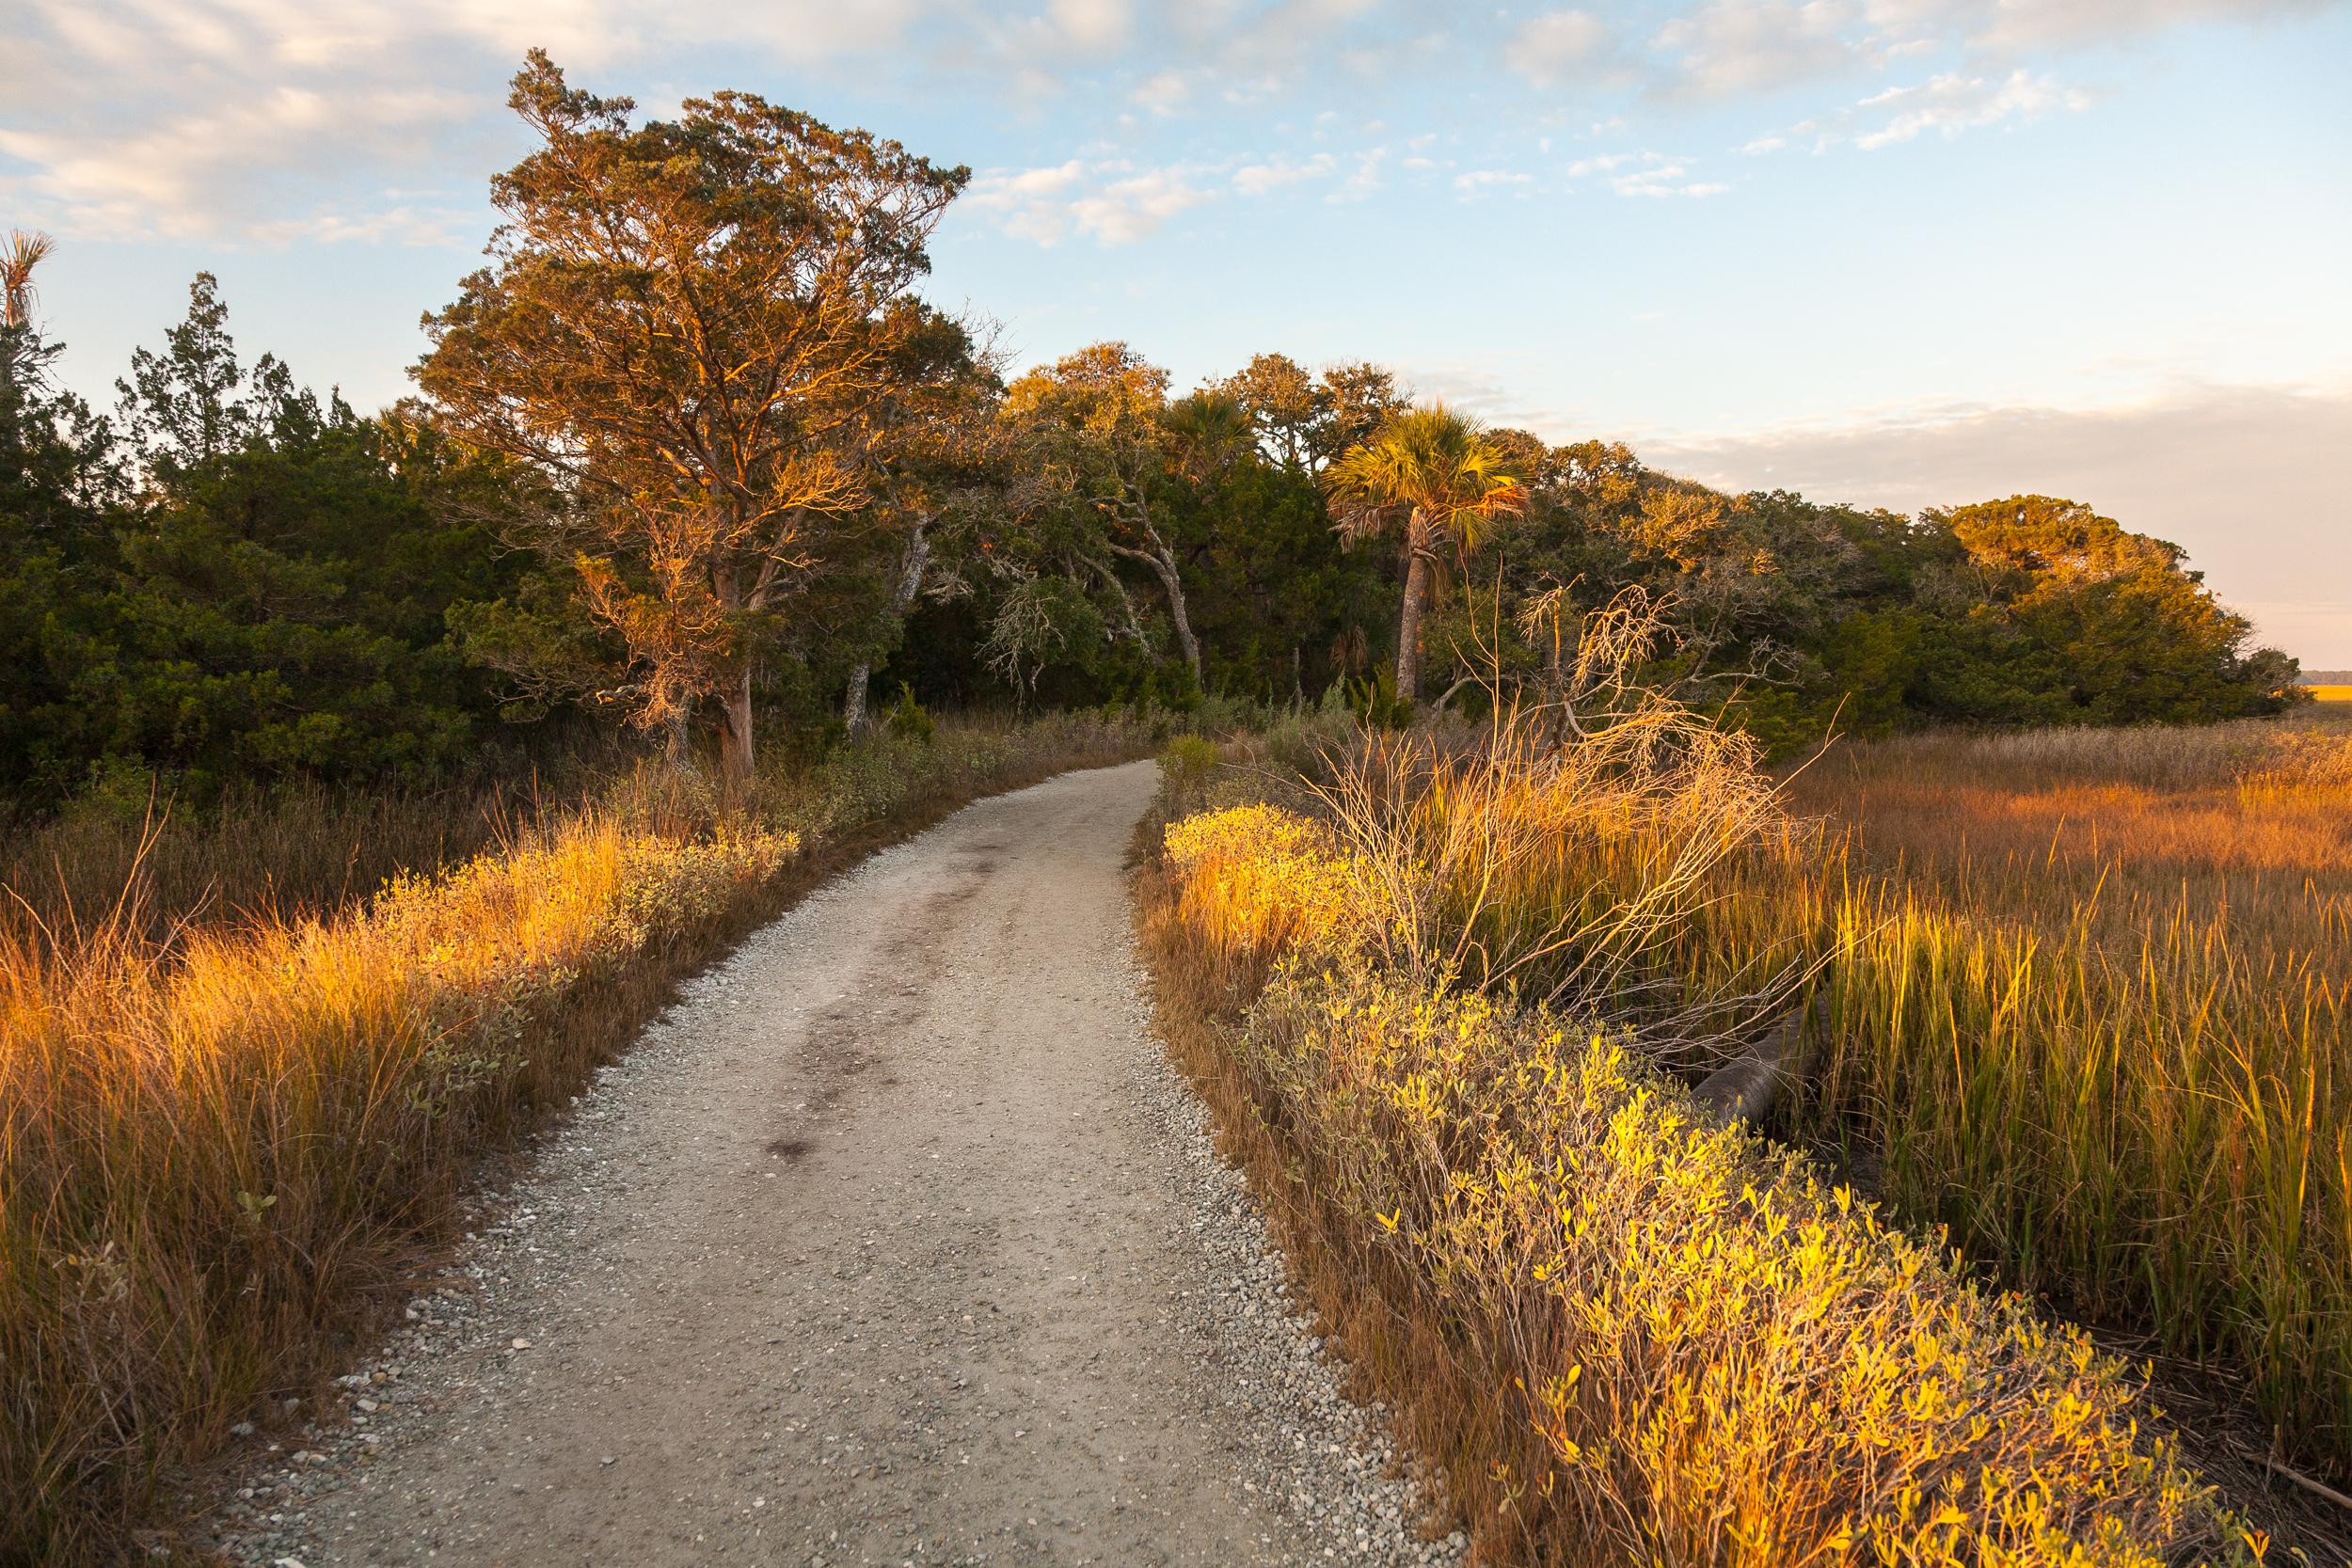 Access road to Edisto Island beach, South Carolina.